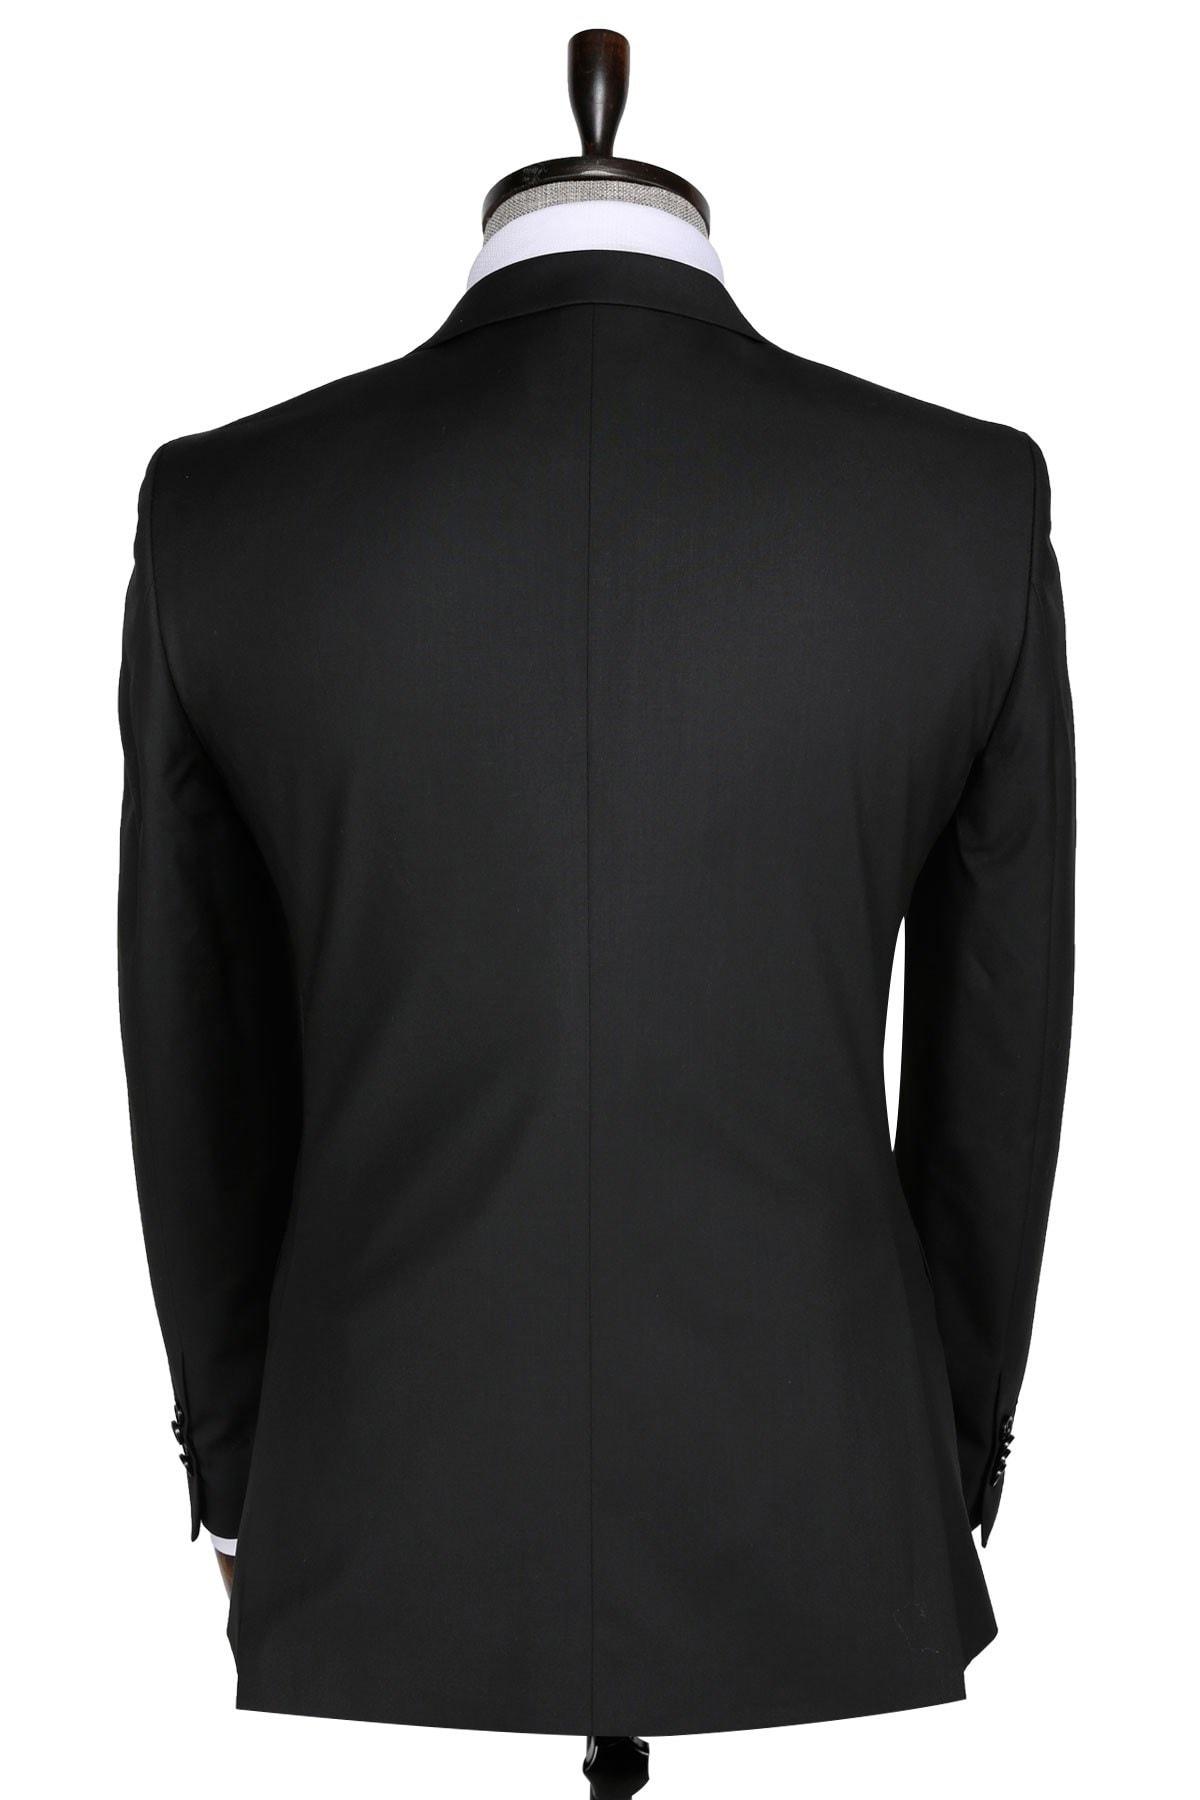 Buenza Slim fit Siyah Erkek Takım Elbise 2